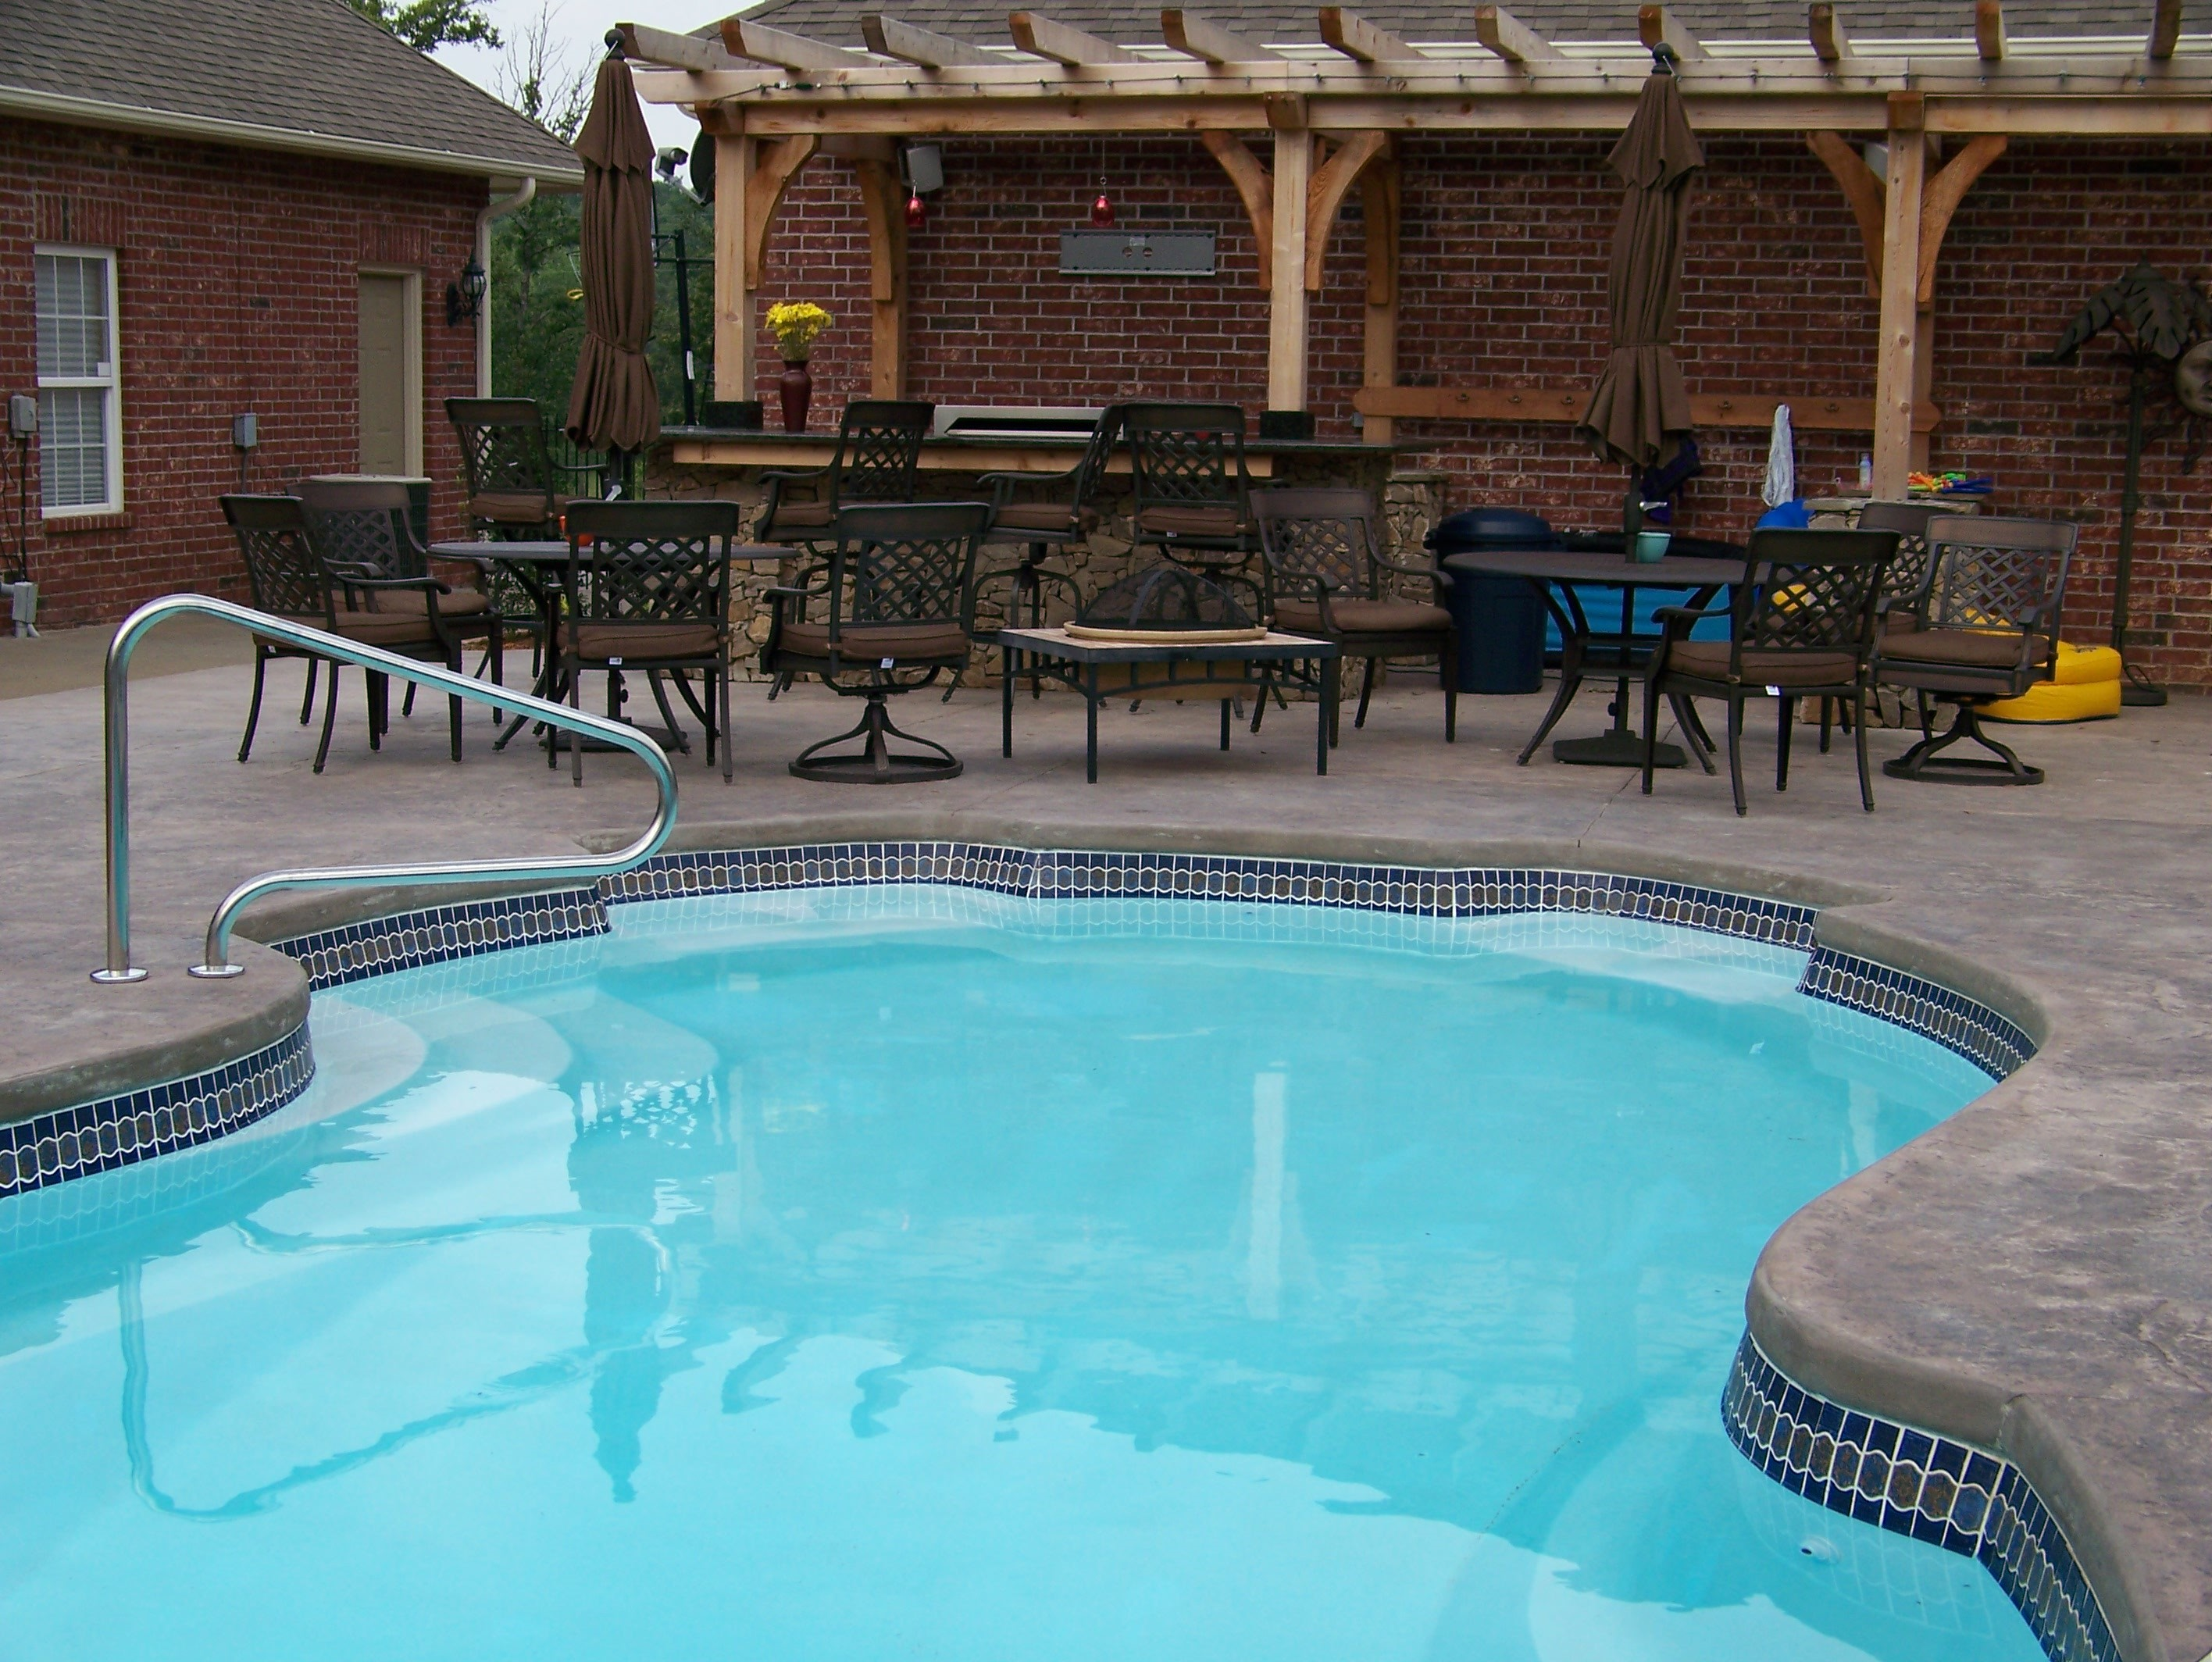 Fiberglass Pools Tile And Concrete Images Swimming Pool Contractor Tulsa Ok